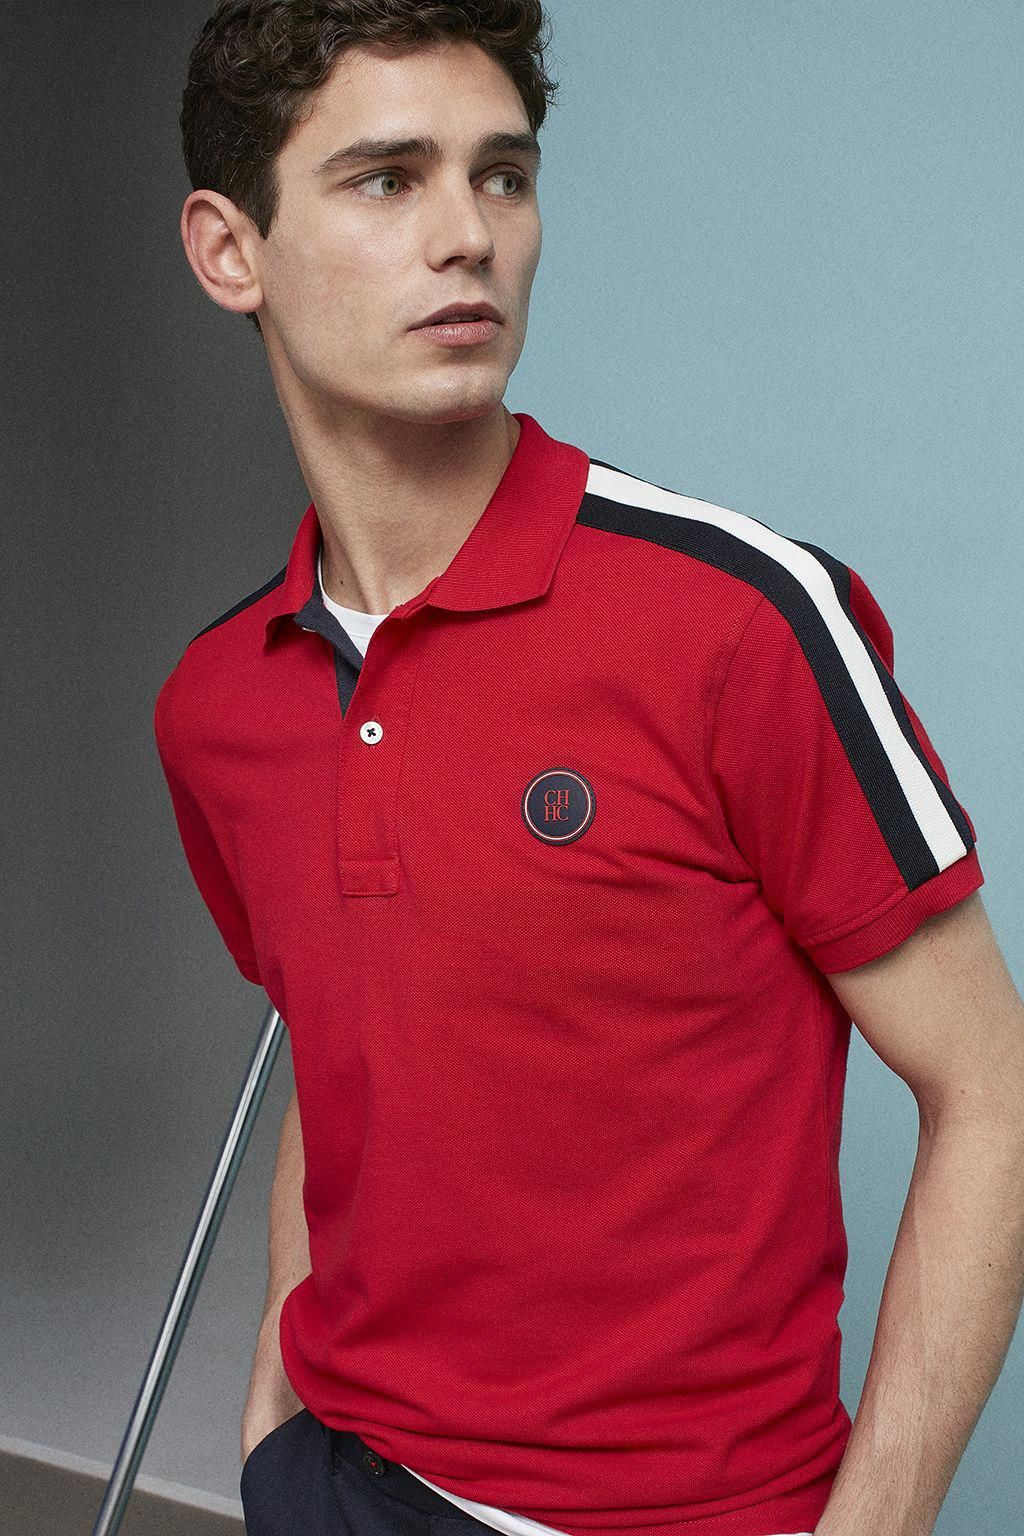 CH carolina herrera jogging  MensT-shirts Mens Polo T Shirts bd46f924484b